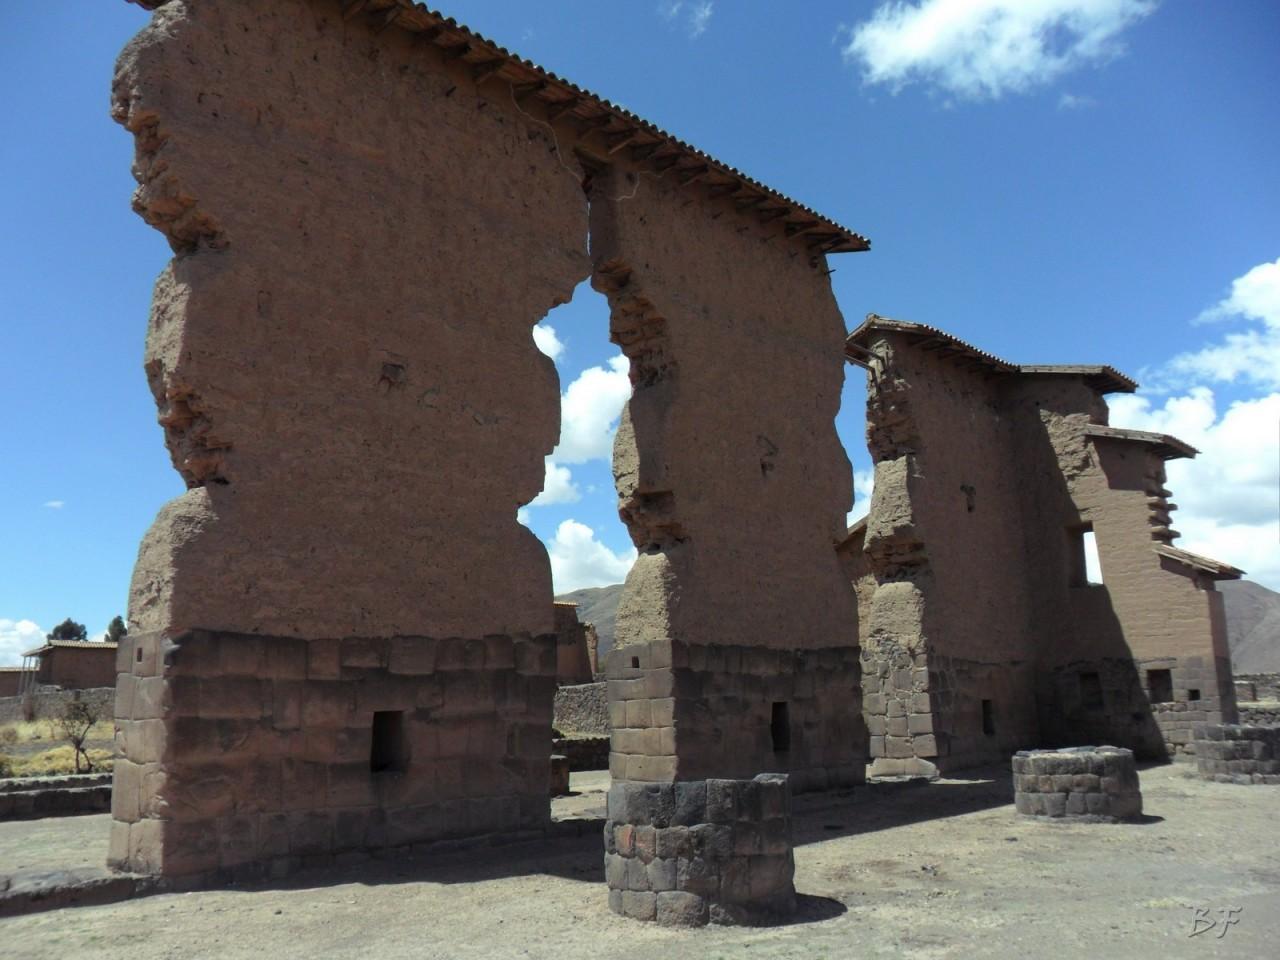 Tempio-di-Viracocha-Megaliti-San-Pedro-Cusco-Perù-6